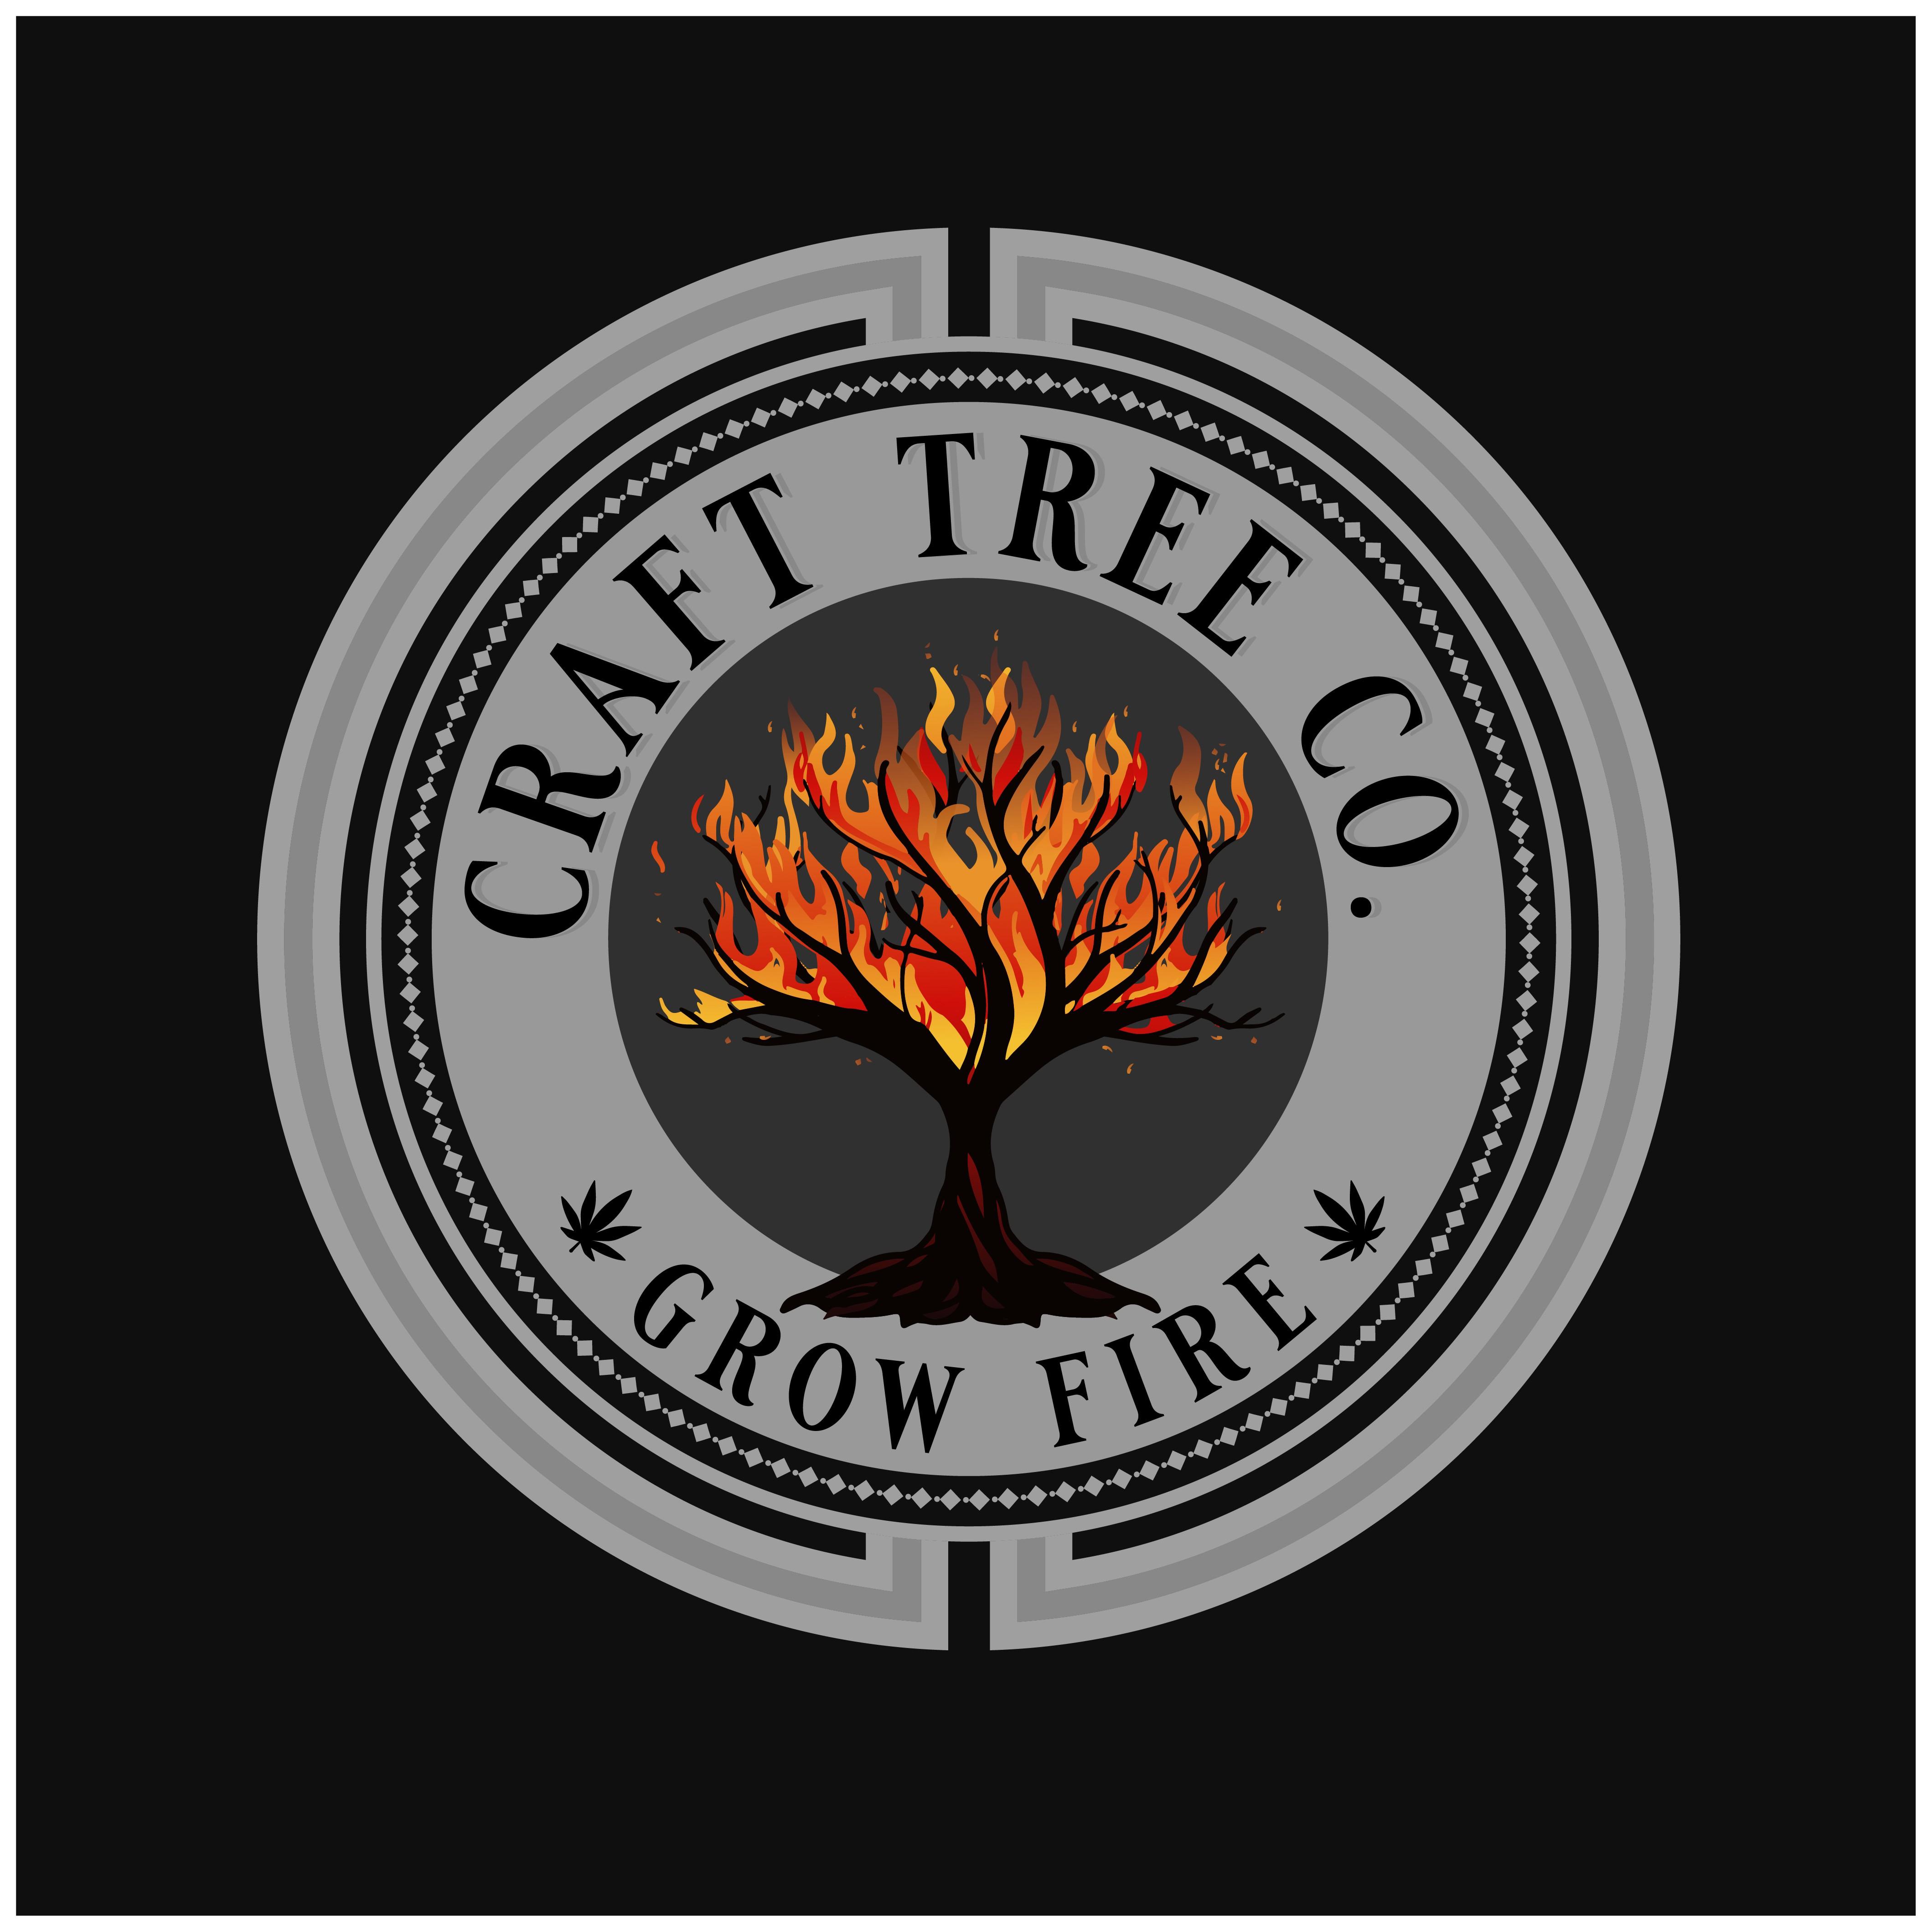 Craft Tree Co.